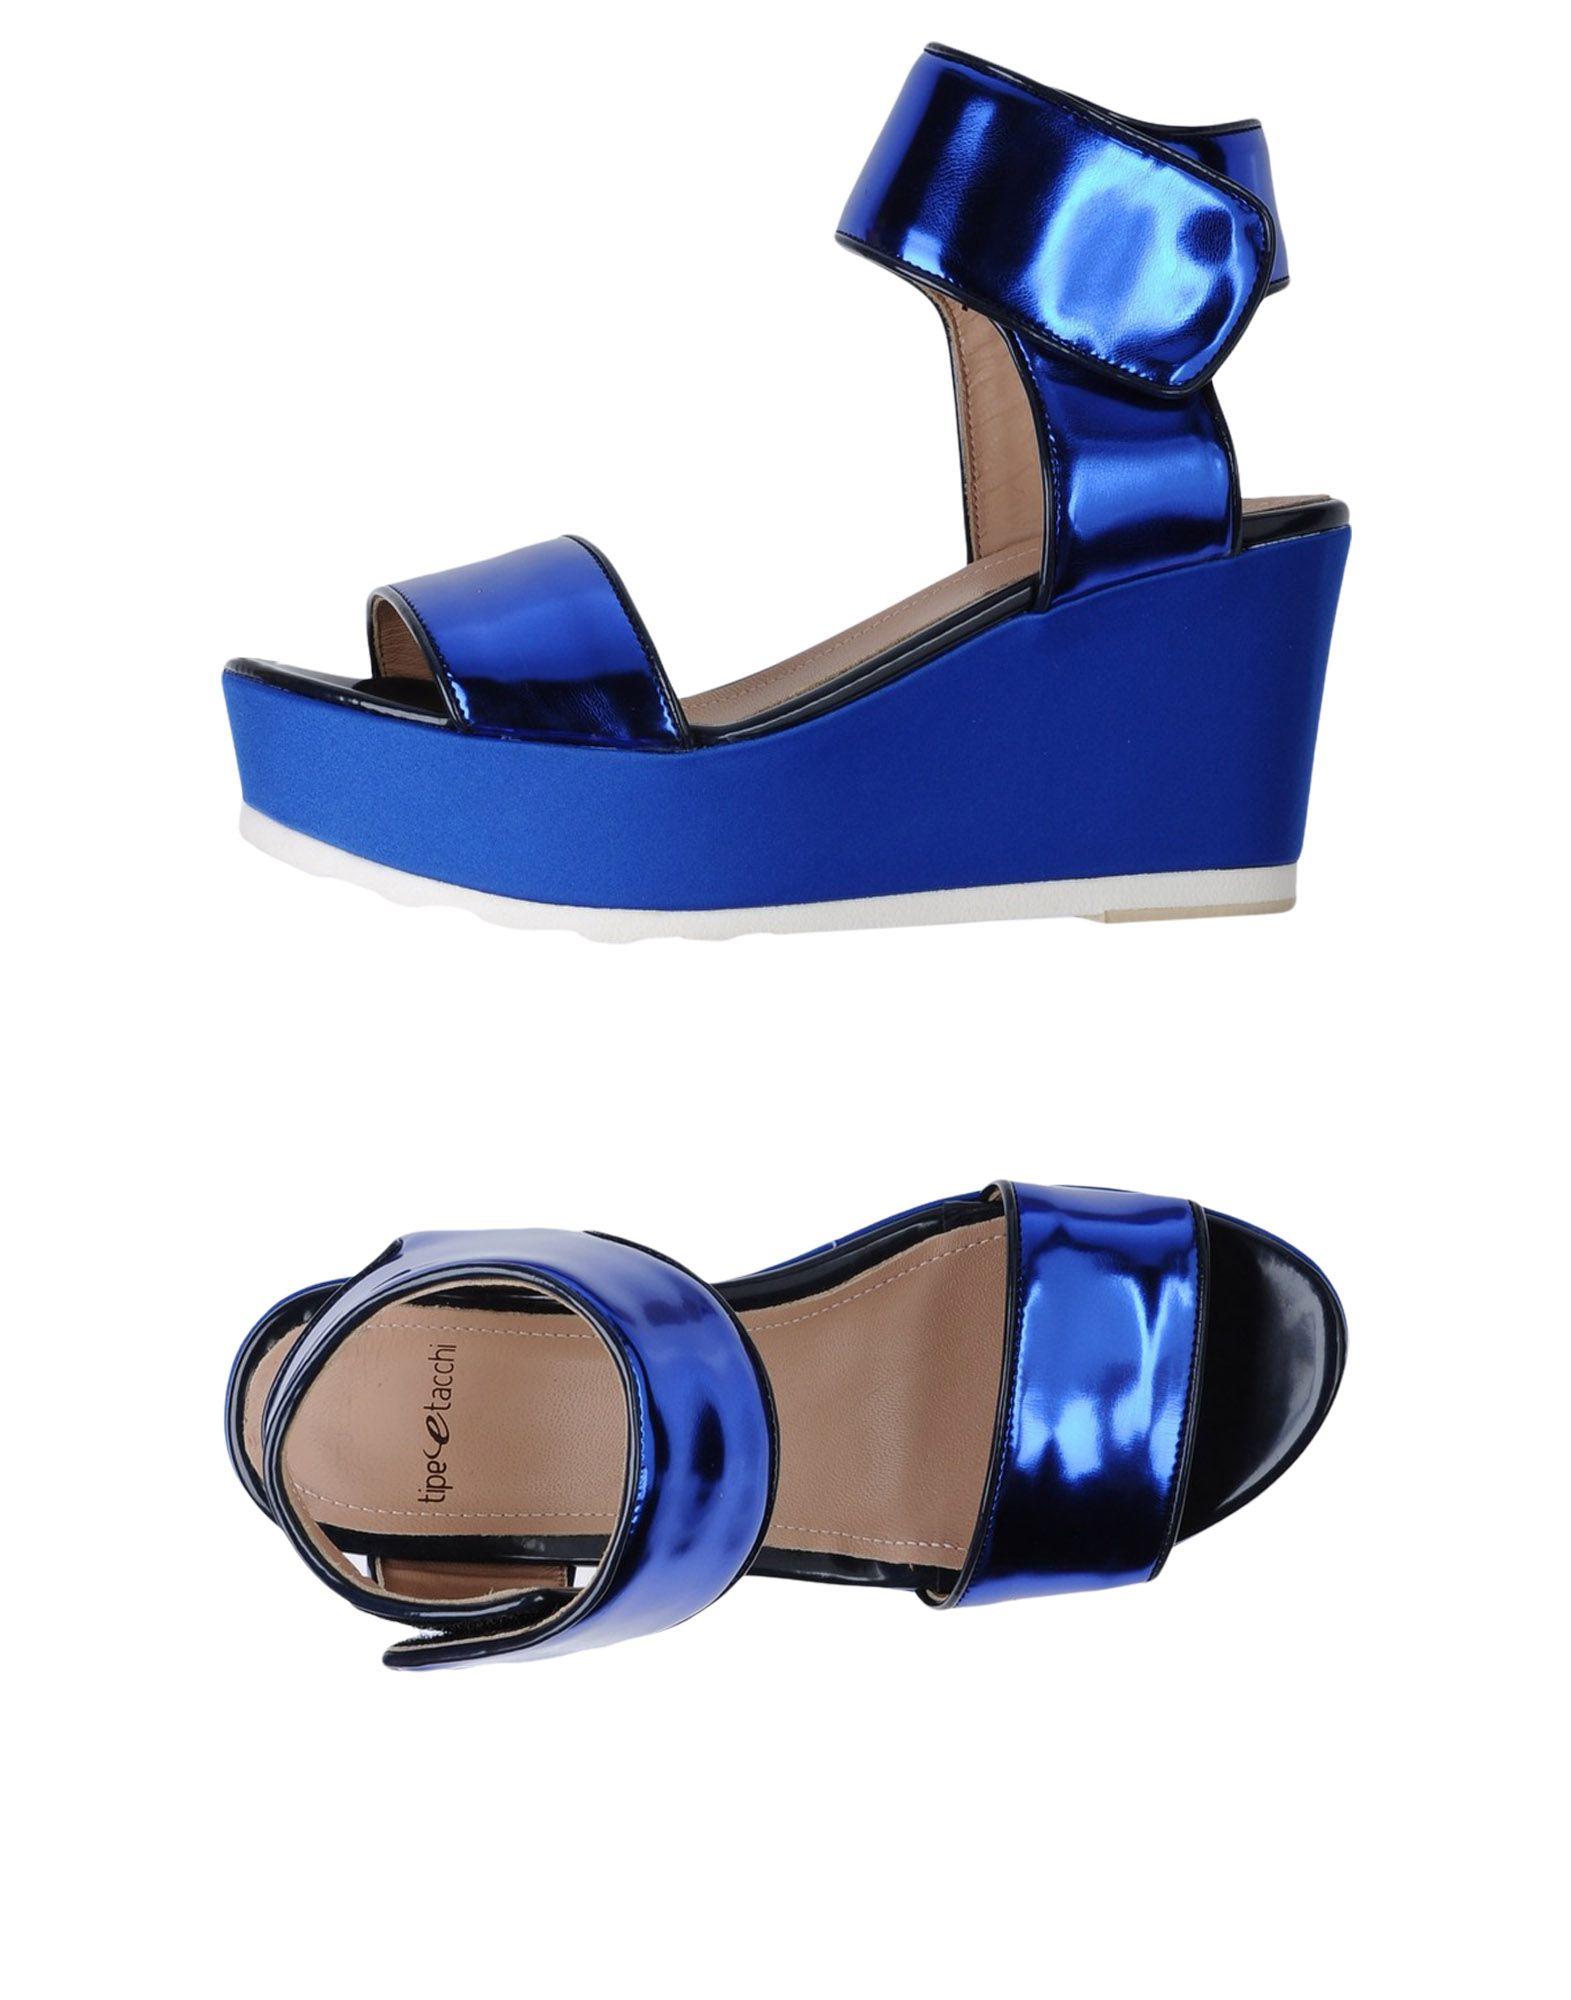 Tipe E Tacchi Sandalen Damen  11340243LP Gute Qualität beliebte Schuhe